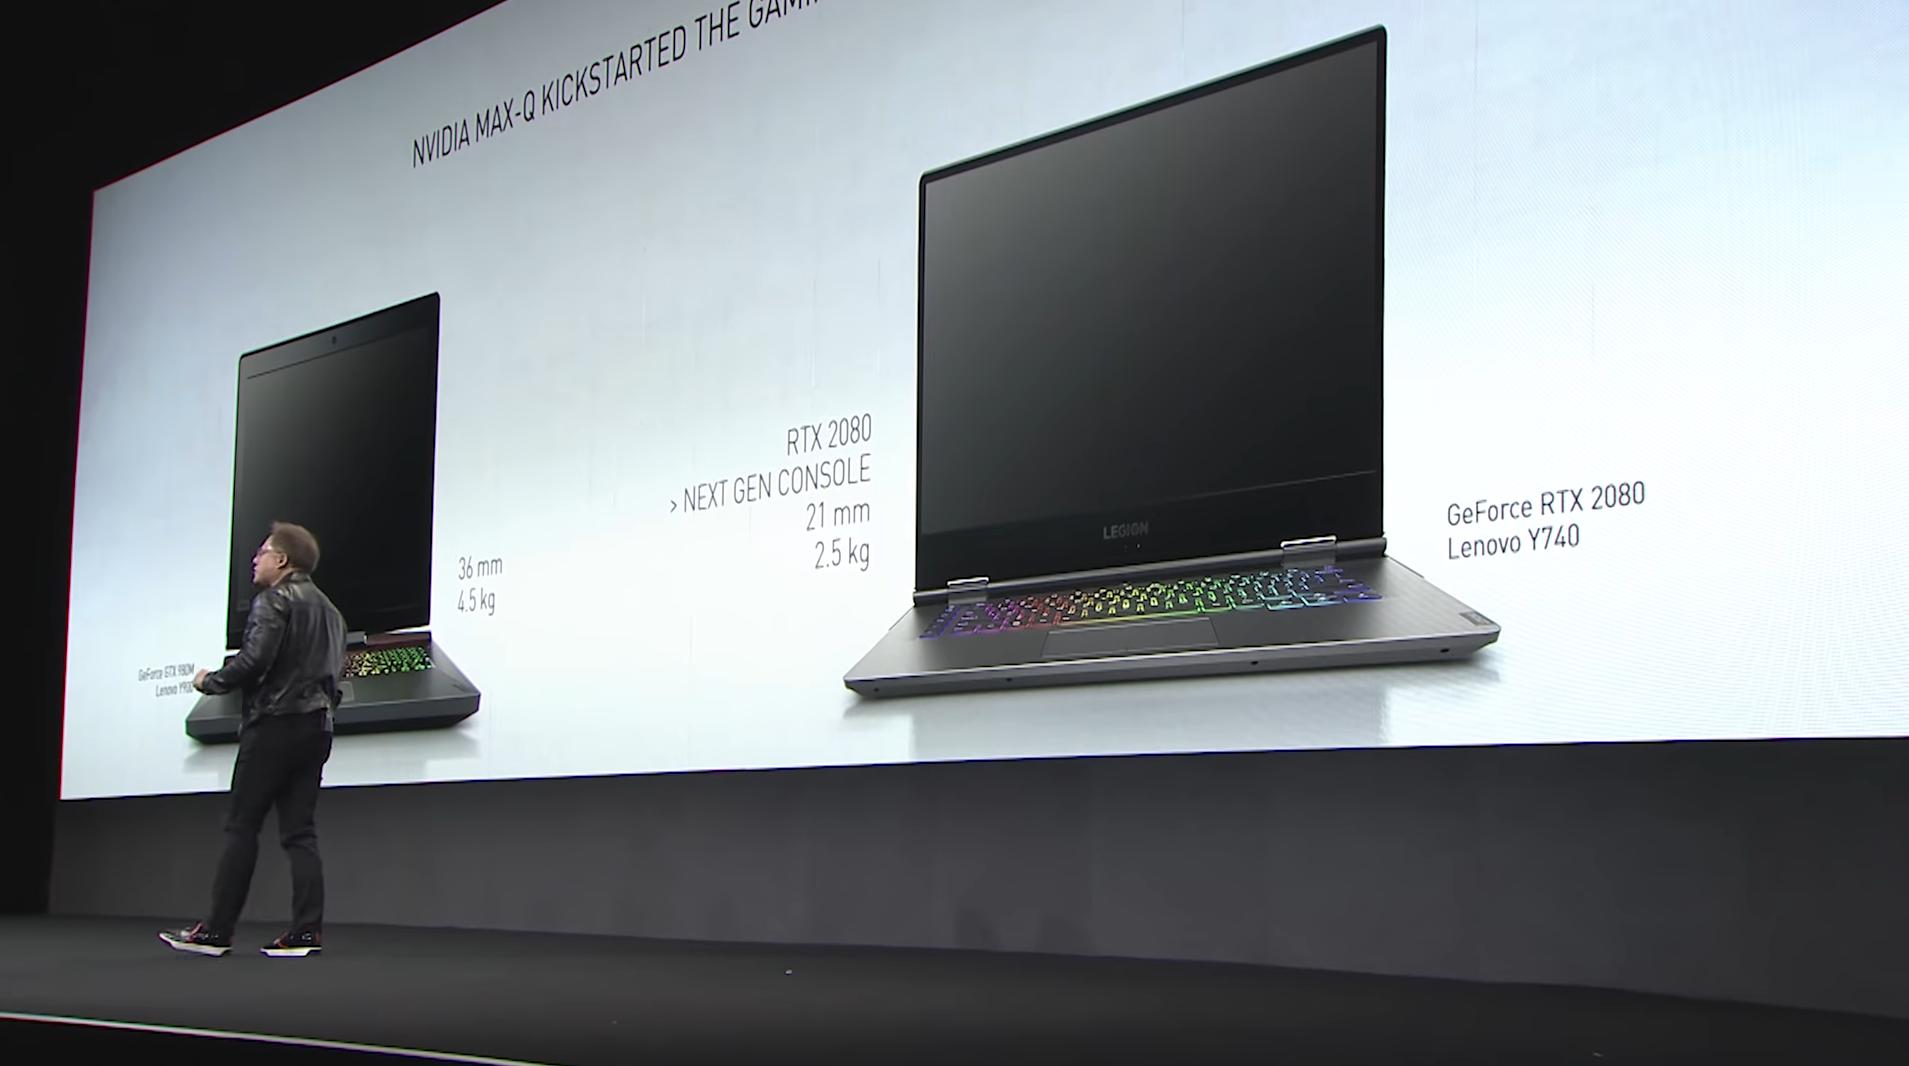 NVIDIA уже победила Sony: похоже, GeForce RTX 2080 окажется мощнее PlayStation 5